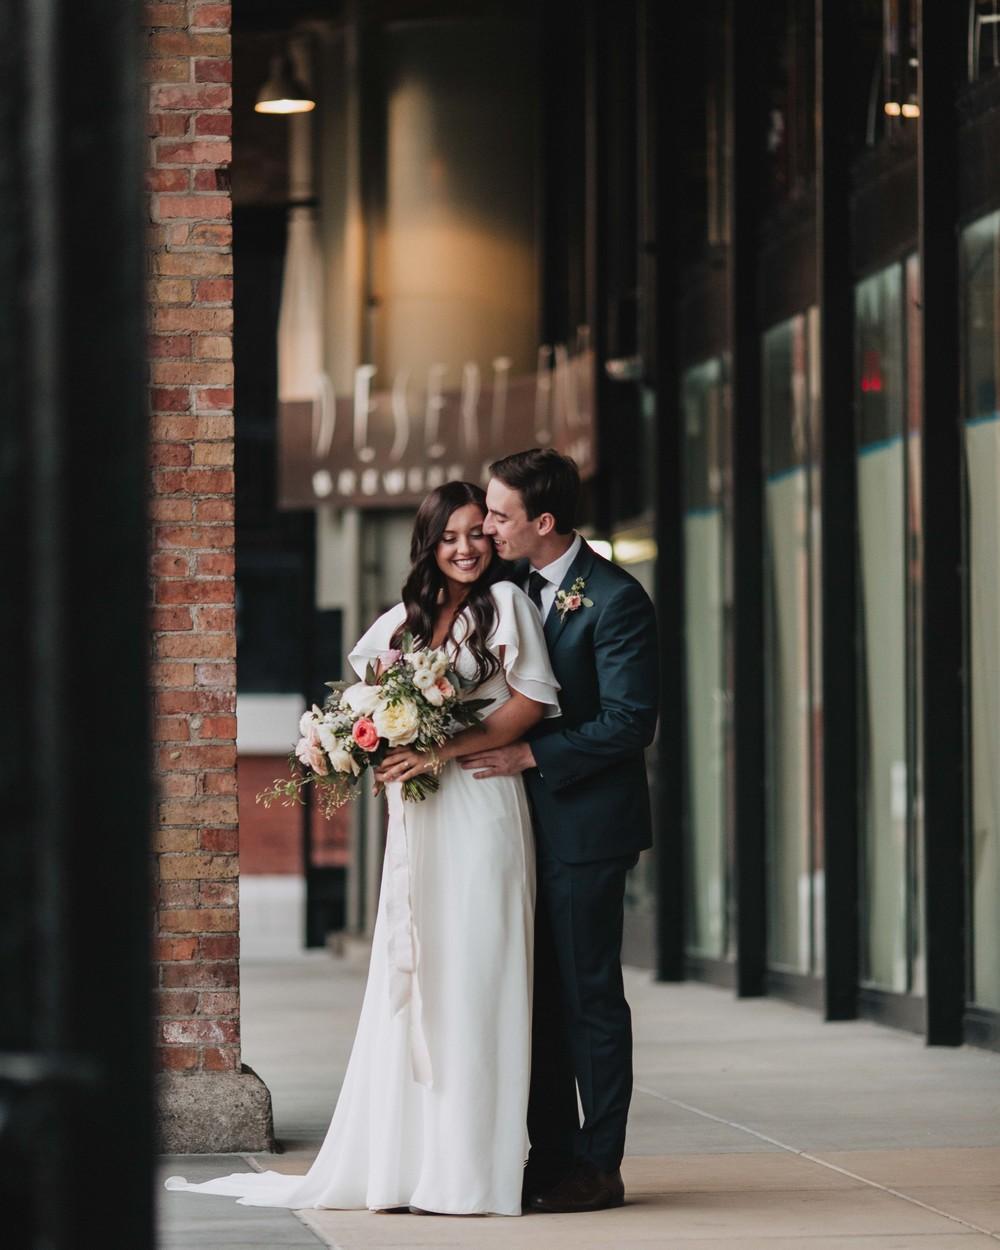 Salt-Lake-City-Wedding-Photographer-30.jpg